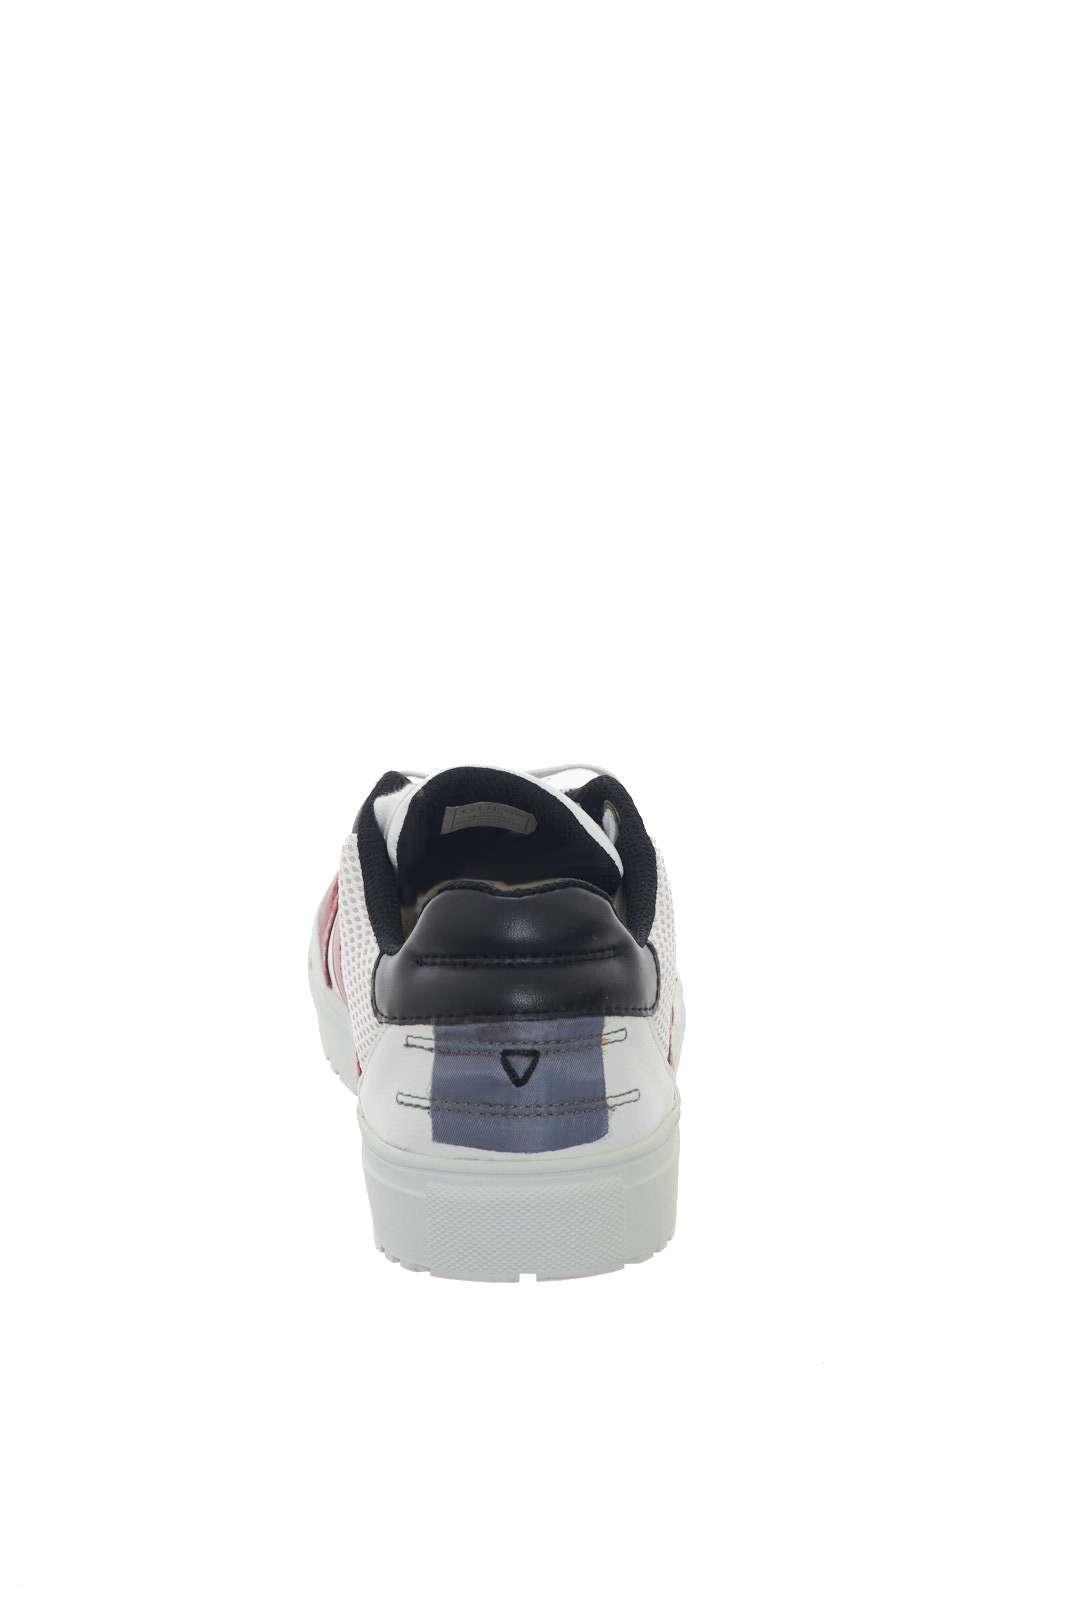 https://www.parmax.com/media/catalog/product/a/i/PE-outlet_parmax-sneaker-uomo-Guess-FM5BRILEA12-D.jpg